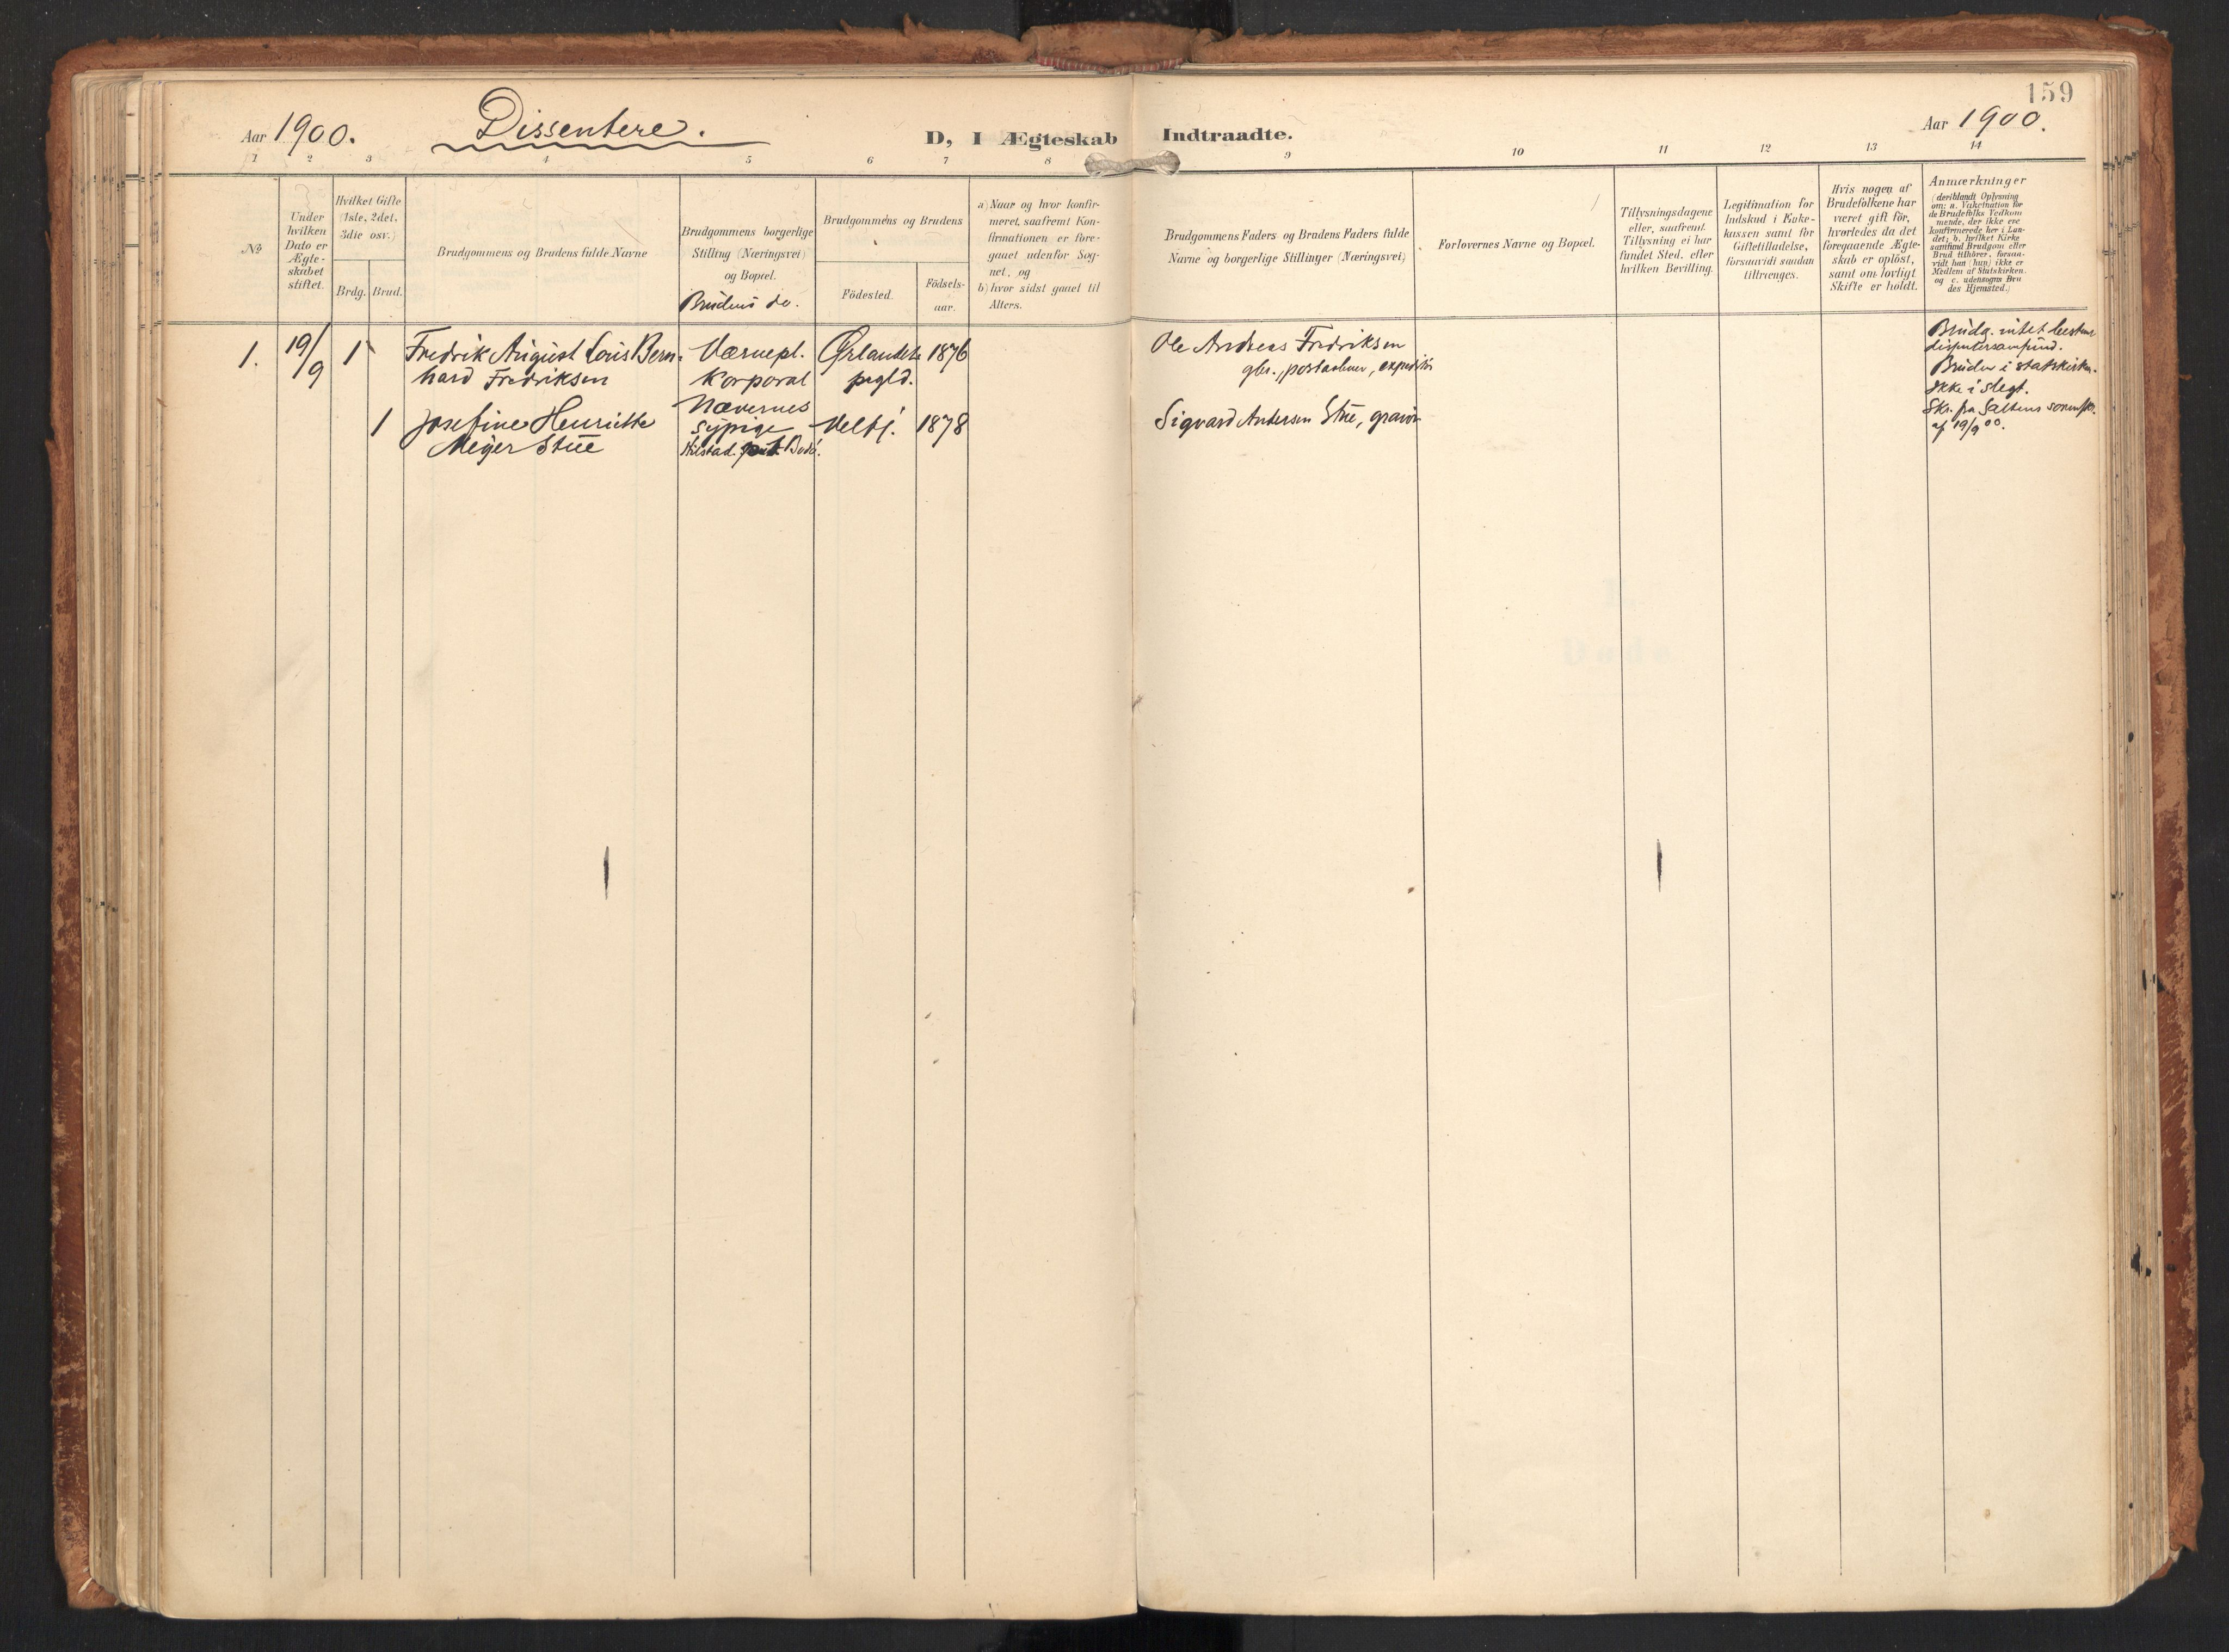 SAT, Ministerialprotokoller, klokkerbøker og fødselsregistre - Nordland, 814/L0227: Ministerialbok nr. 814A08, 1899-1920, s. 159